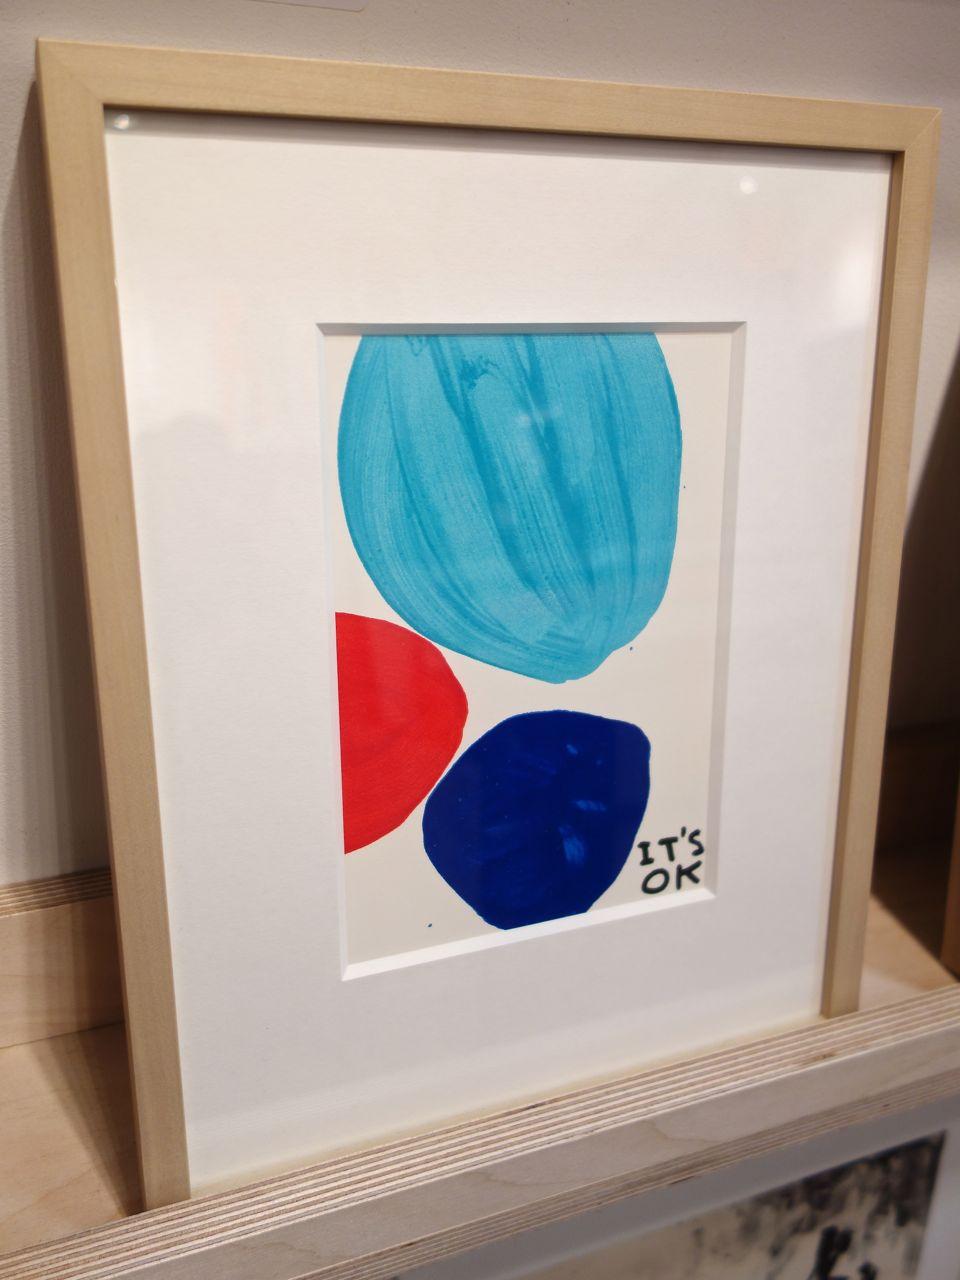 David Shrigley, 'It's OK', 2016, 10-colour screenprint, 20.8 x 14.5 cm. Jealous Gallery (London)